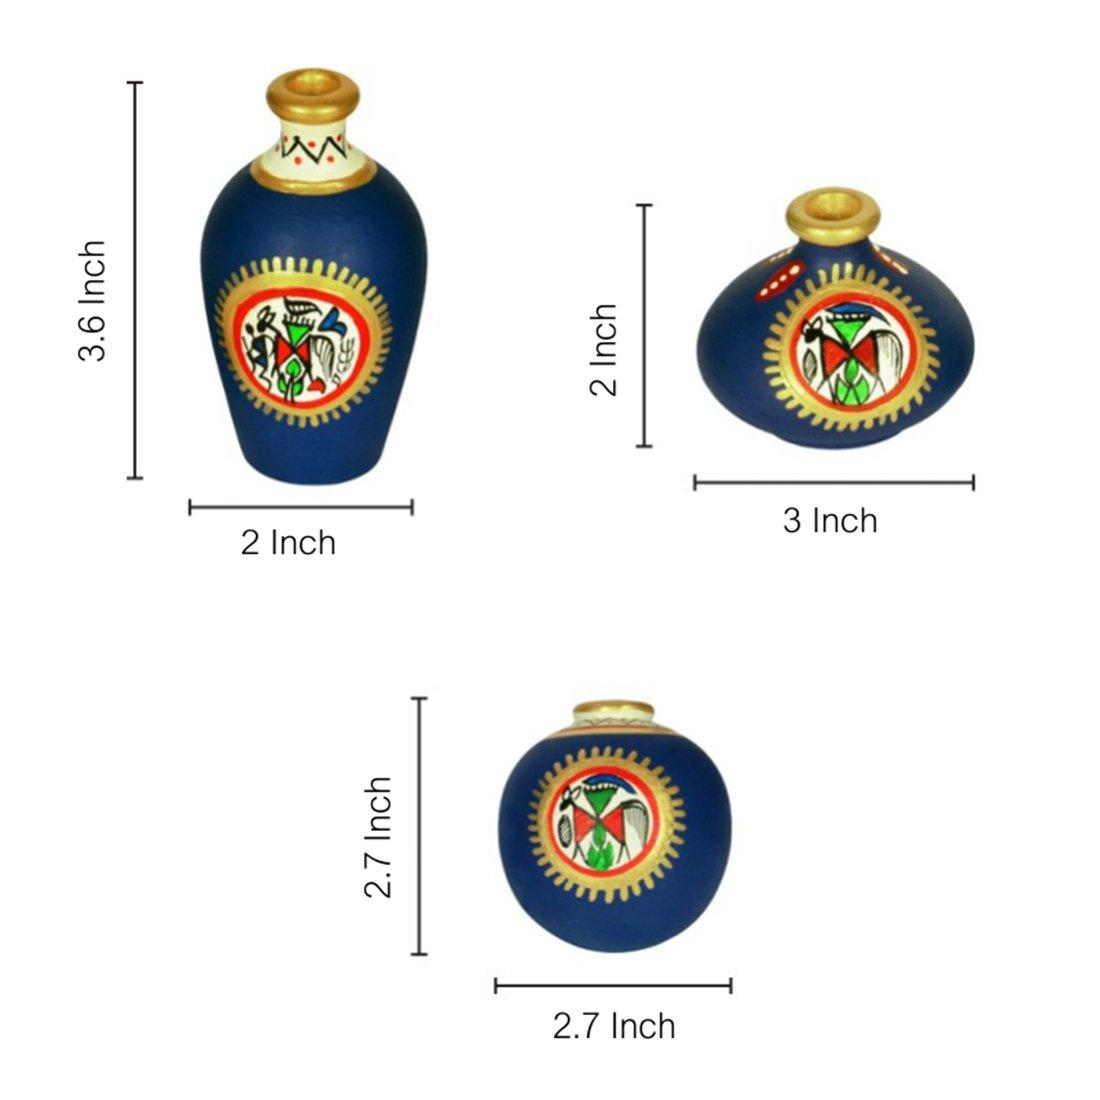 warlipainting-pots-madhubanipainting-pots-miniature-pots-homedecor